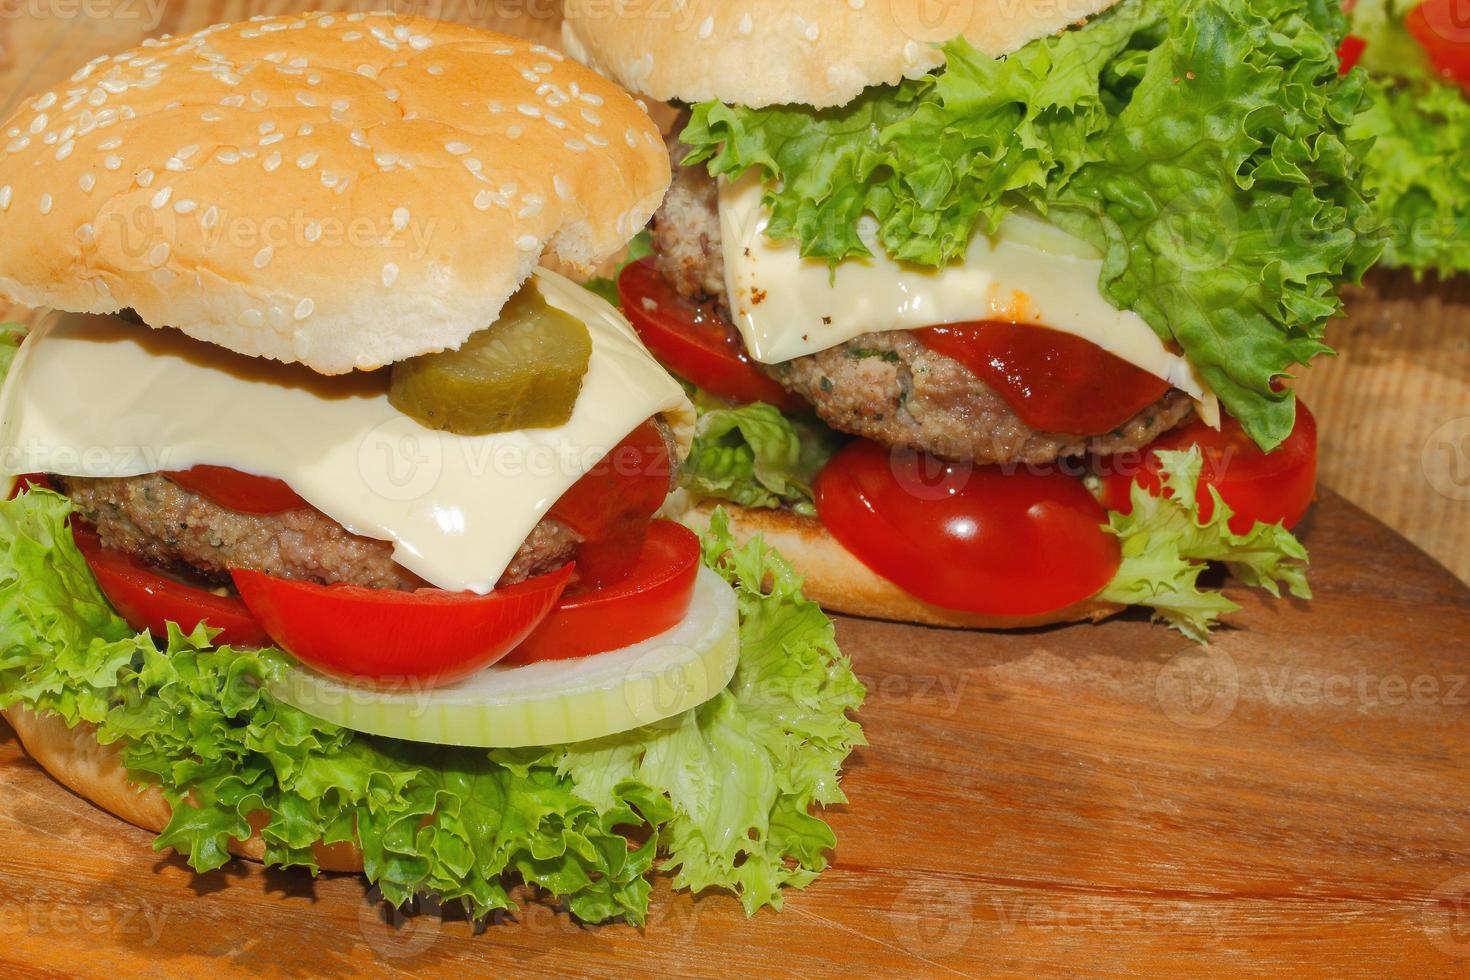 hambúrgueres, fast food, hambúrguer, bife de hambúrguer, alface, tomate, queijo, pepino foto